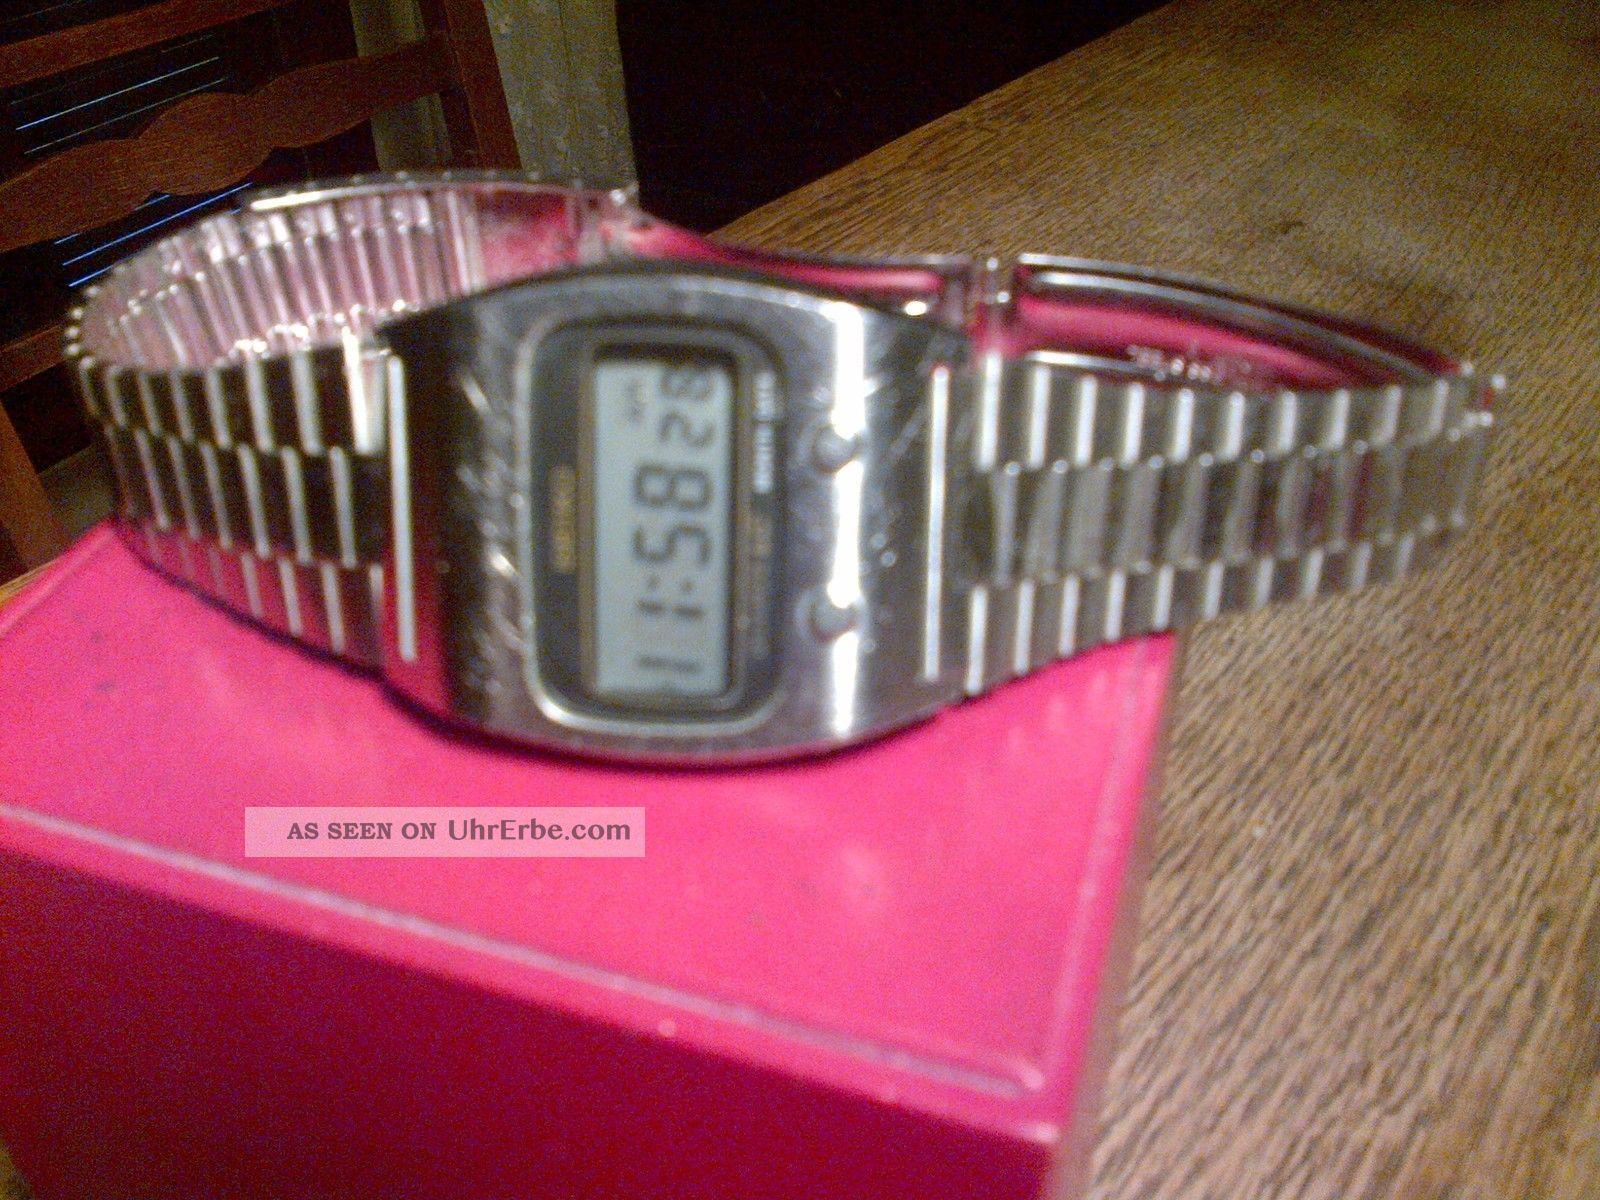 Seiko Digital Quartz Herren - Lcd Uhr Aus Den 70ern /vintage Seiko Lcd Men ' S Watch Armbanduhren Bild